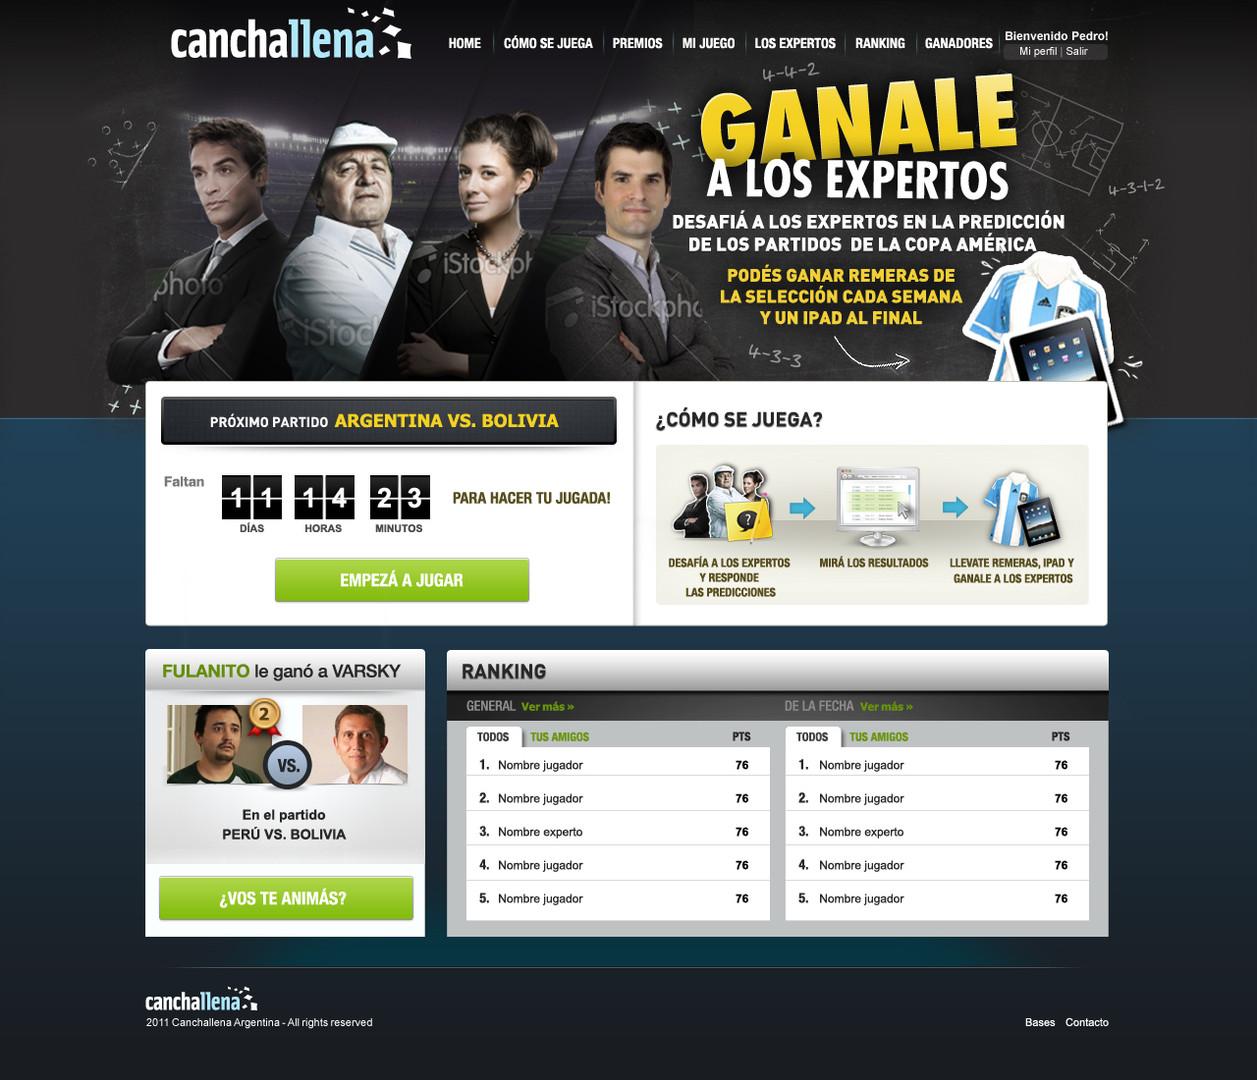 canchallena1.jpg